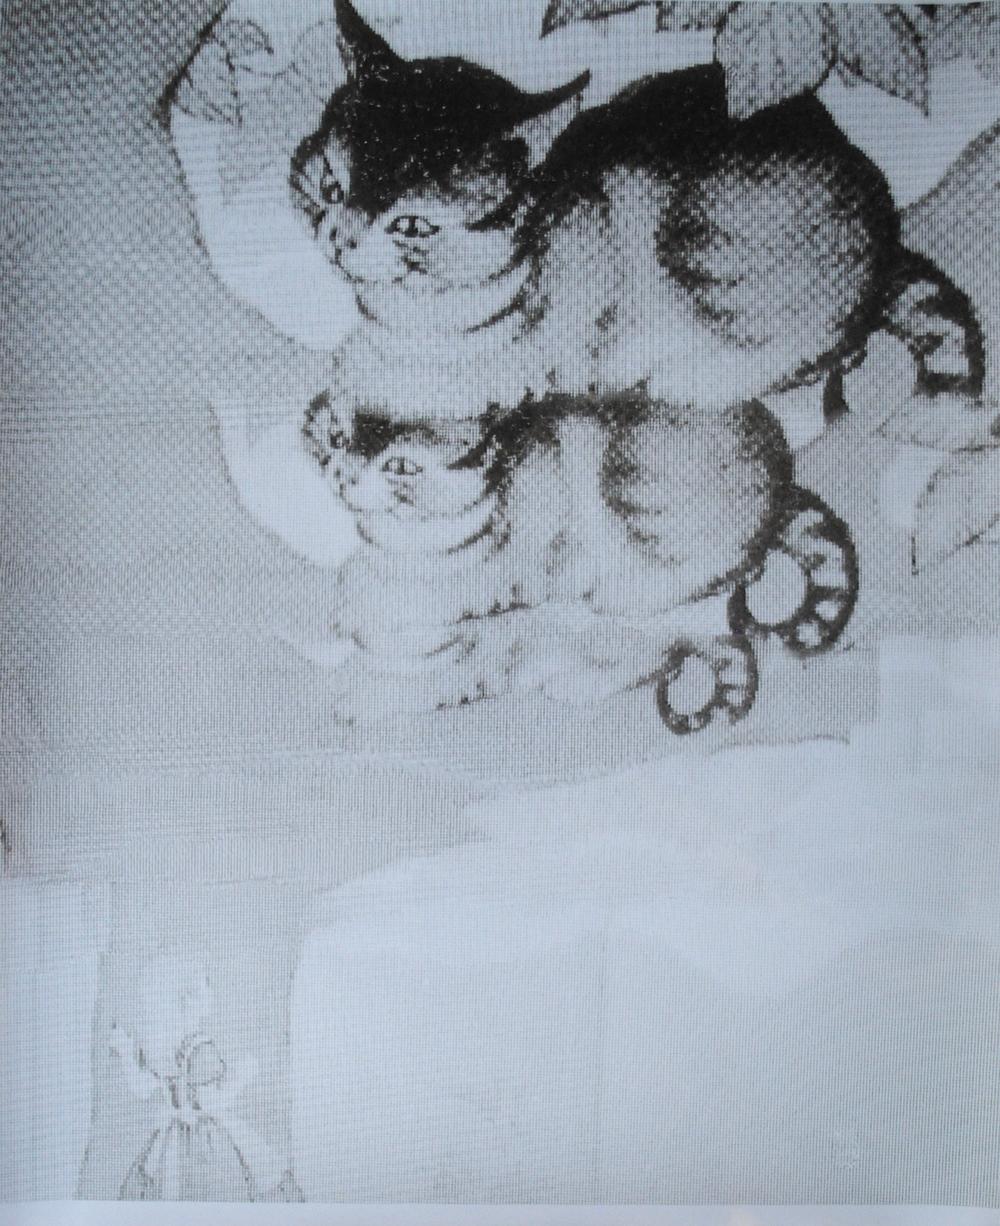 "16x20"",Inkjet Print on Raw Photo Paper"